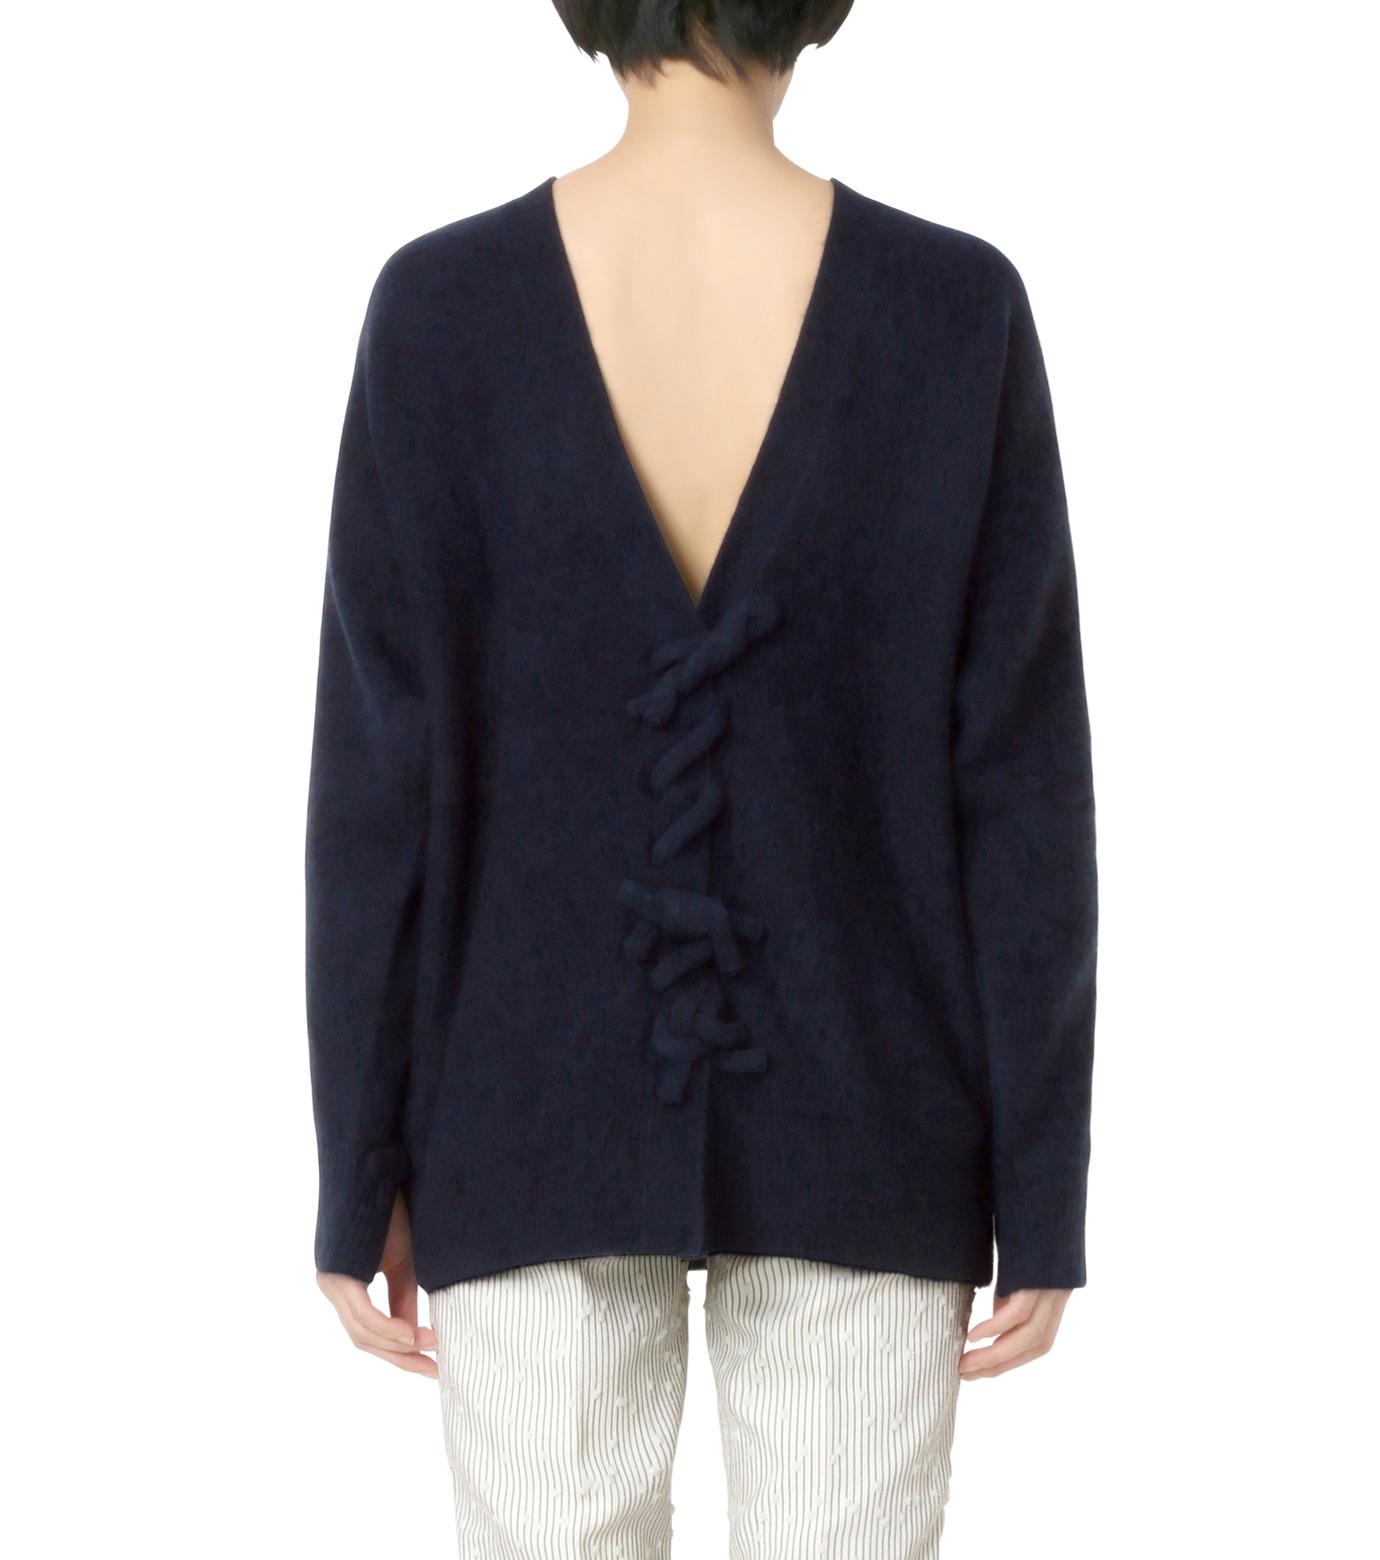 3.1 Phillip Lim(スリーワン フィリップリム)のLS Sweater w/Back V&Knots-NAVY(ニット/knit)-P161-7631PCY-93 拡大詳細画像2